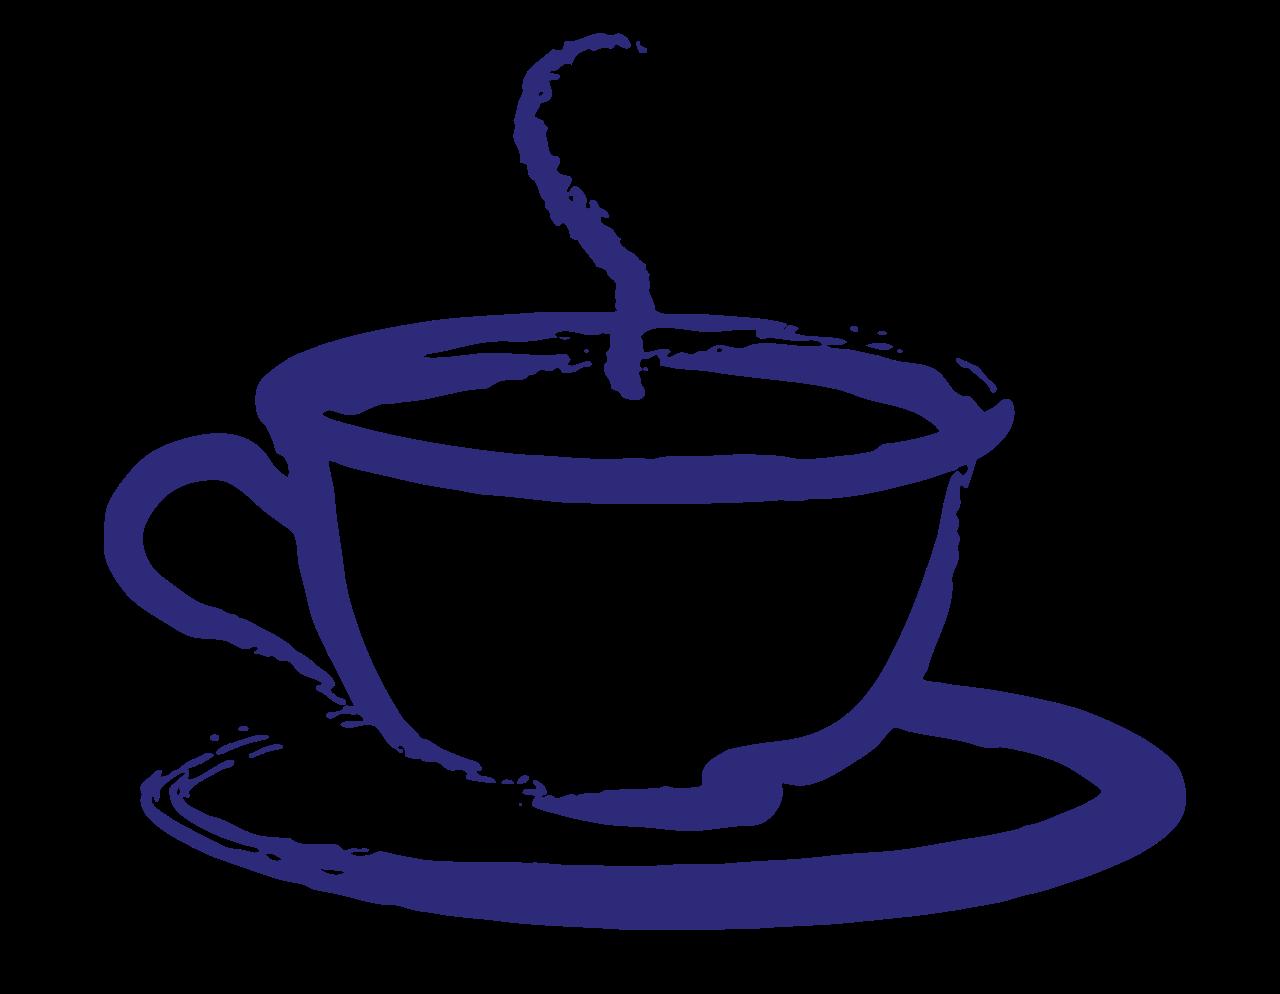 Teacup clipart free clip art image